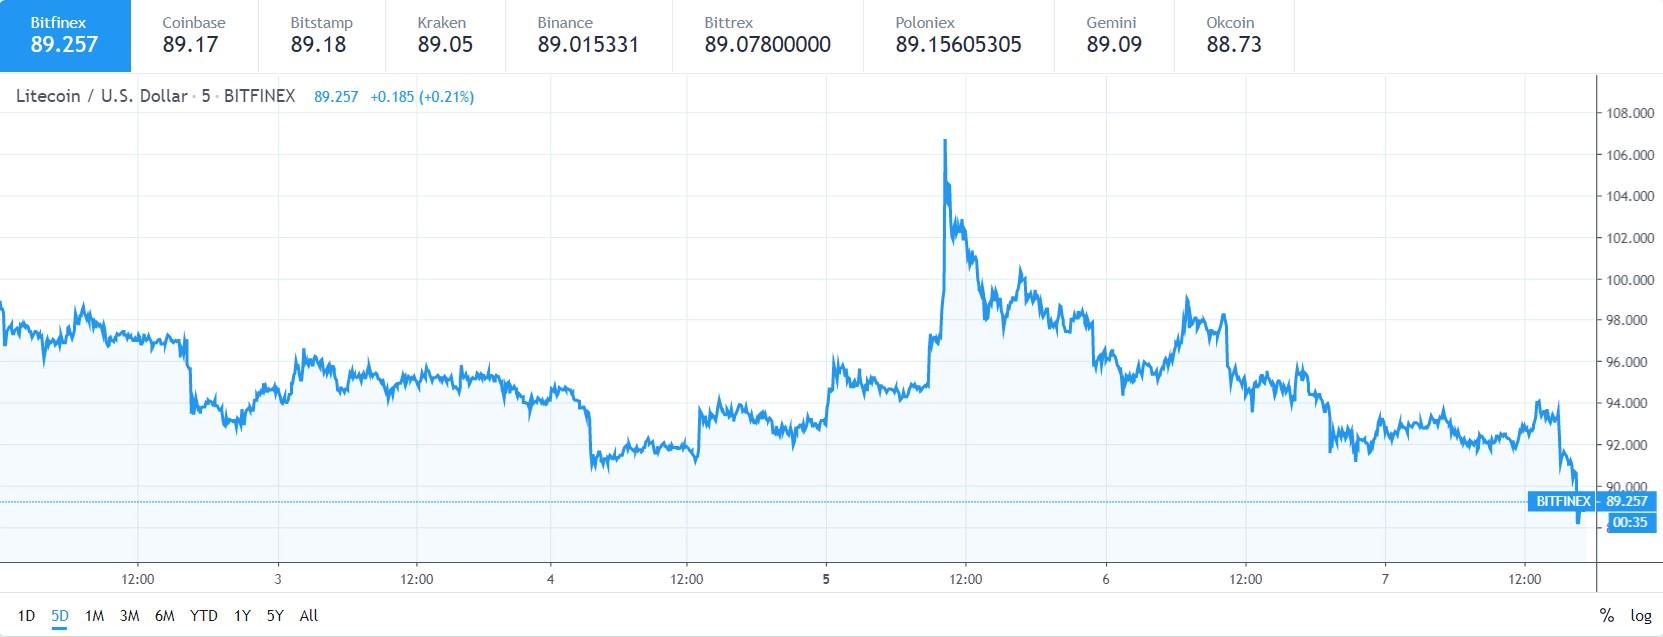 Litecoin price analysis